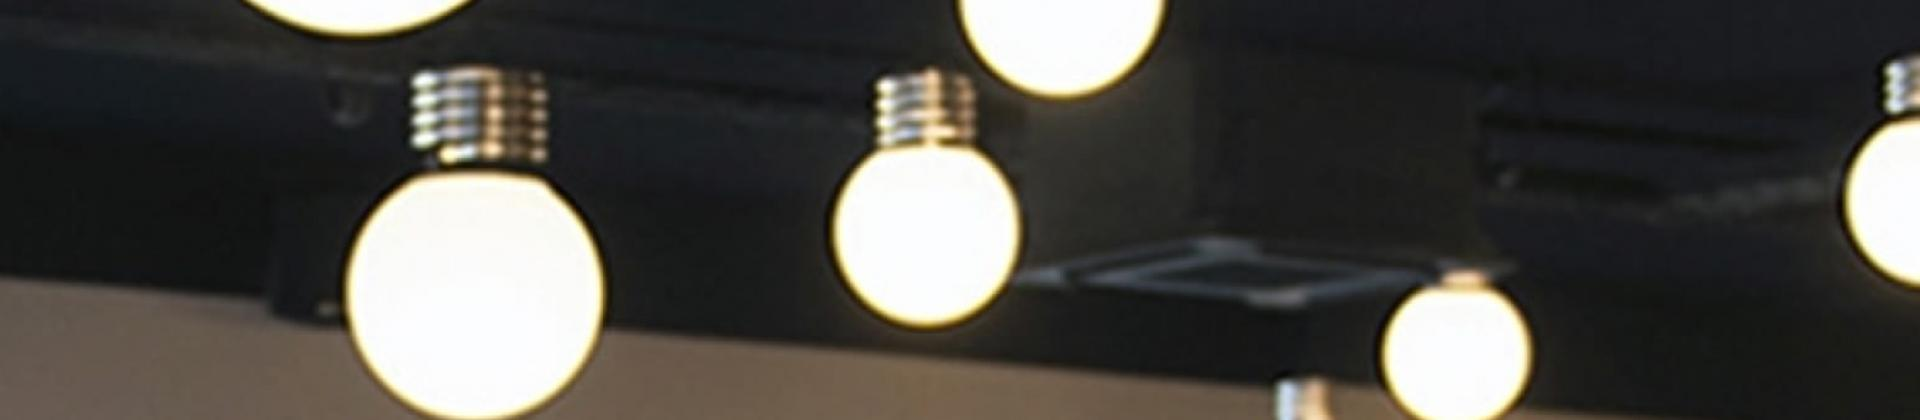 0,699 DORR - Lámparas de diseño